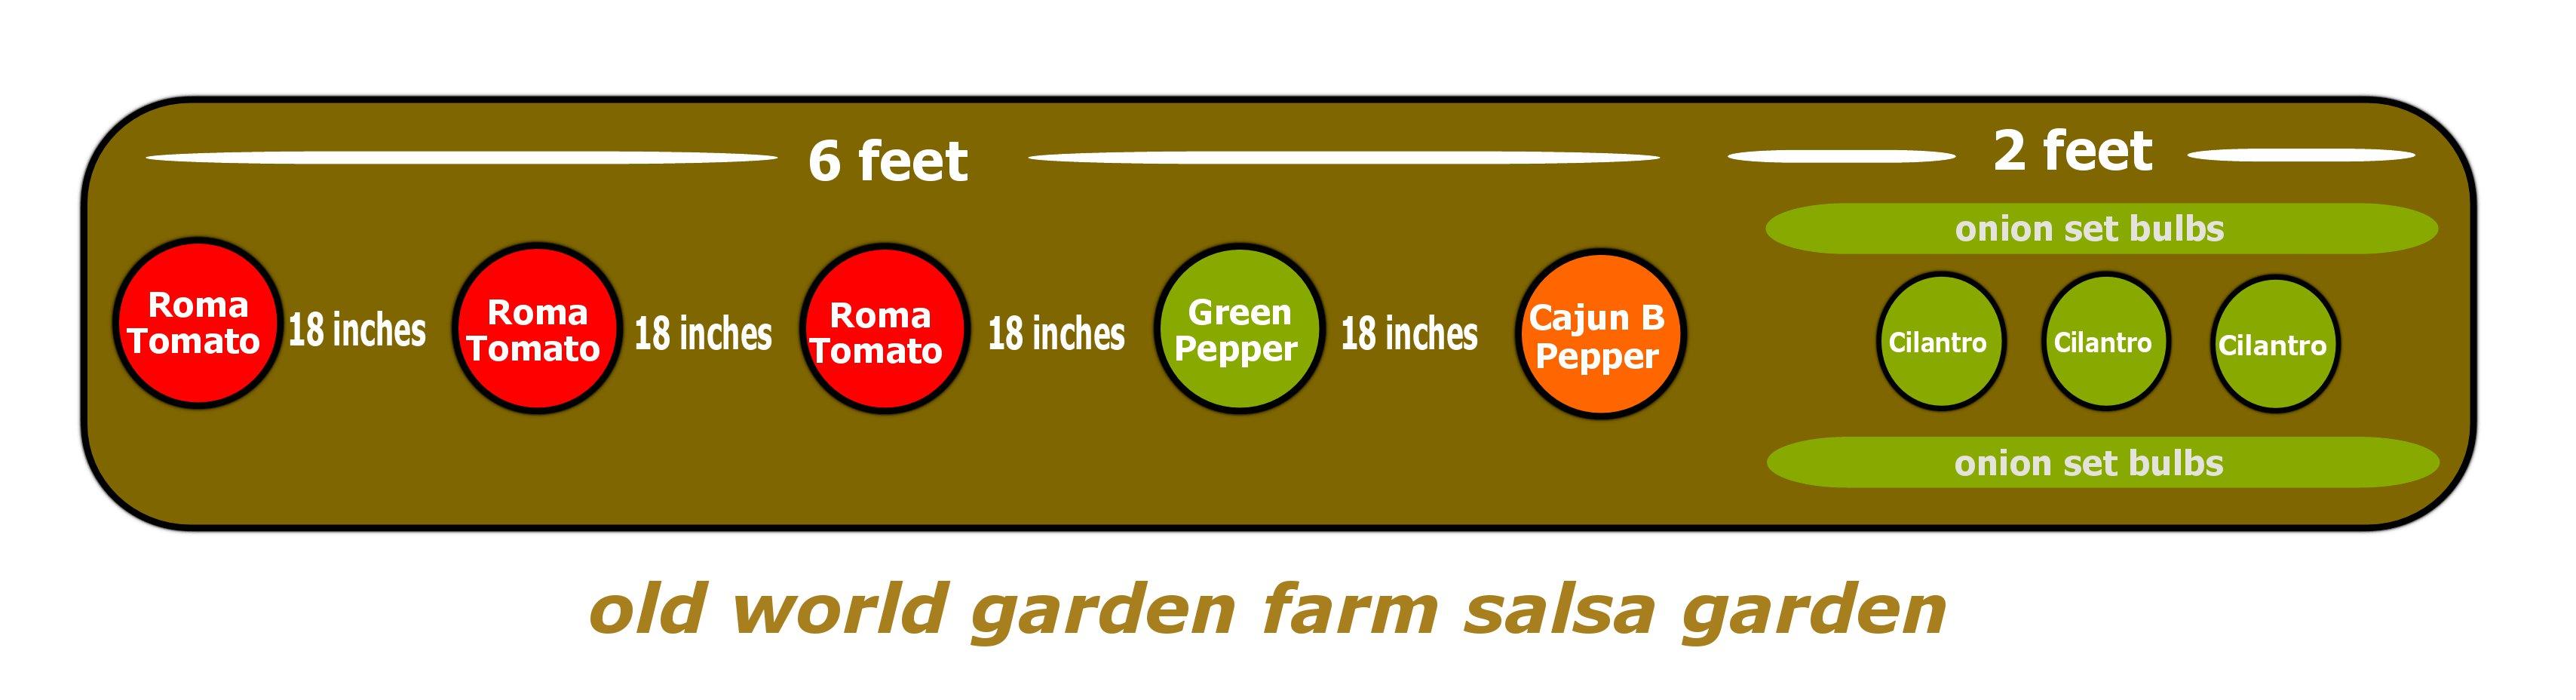 Plant A Salsa Garden In One Hour! Old World Garden Farms